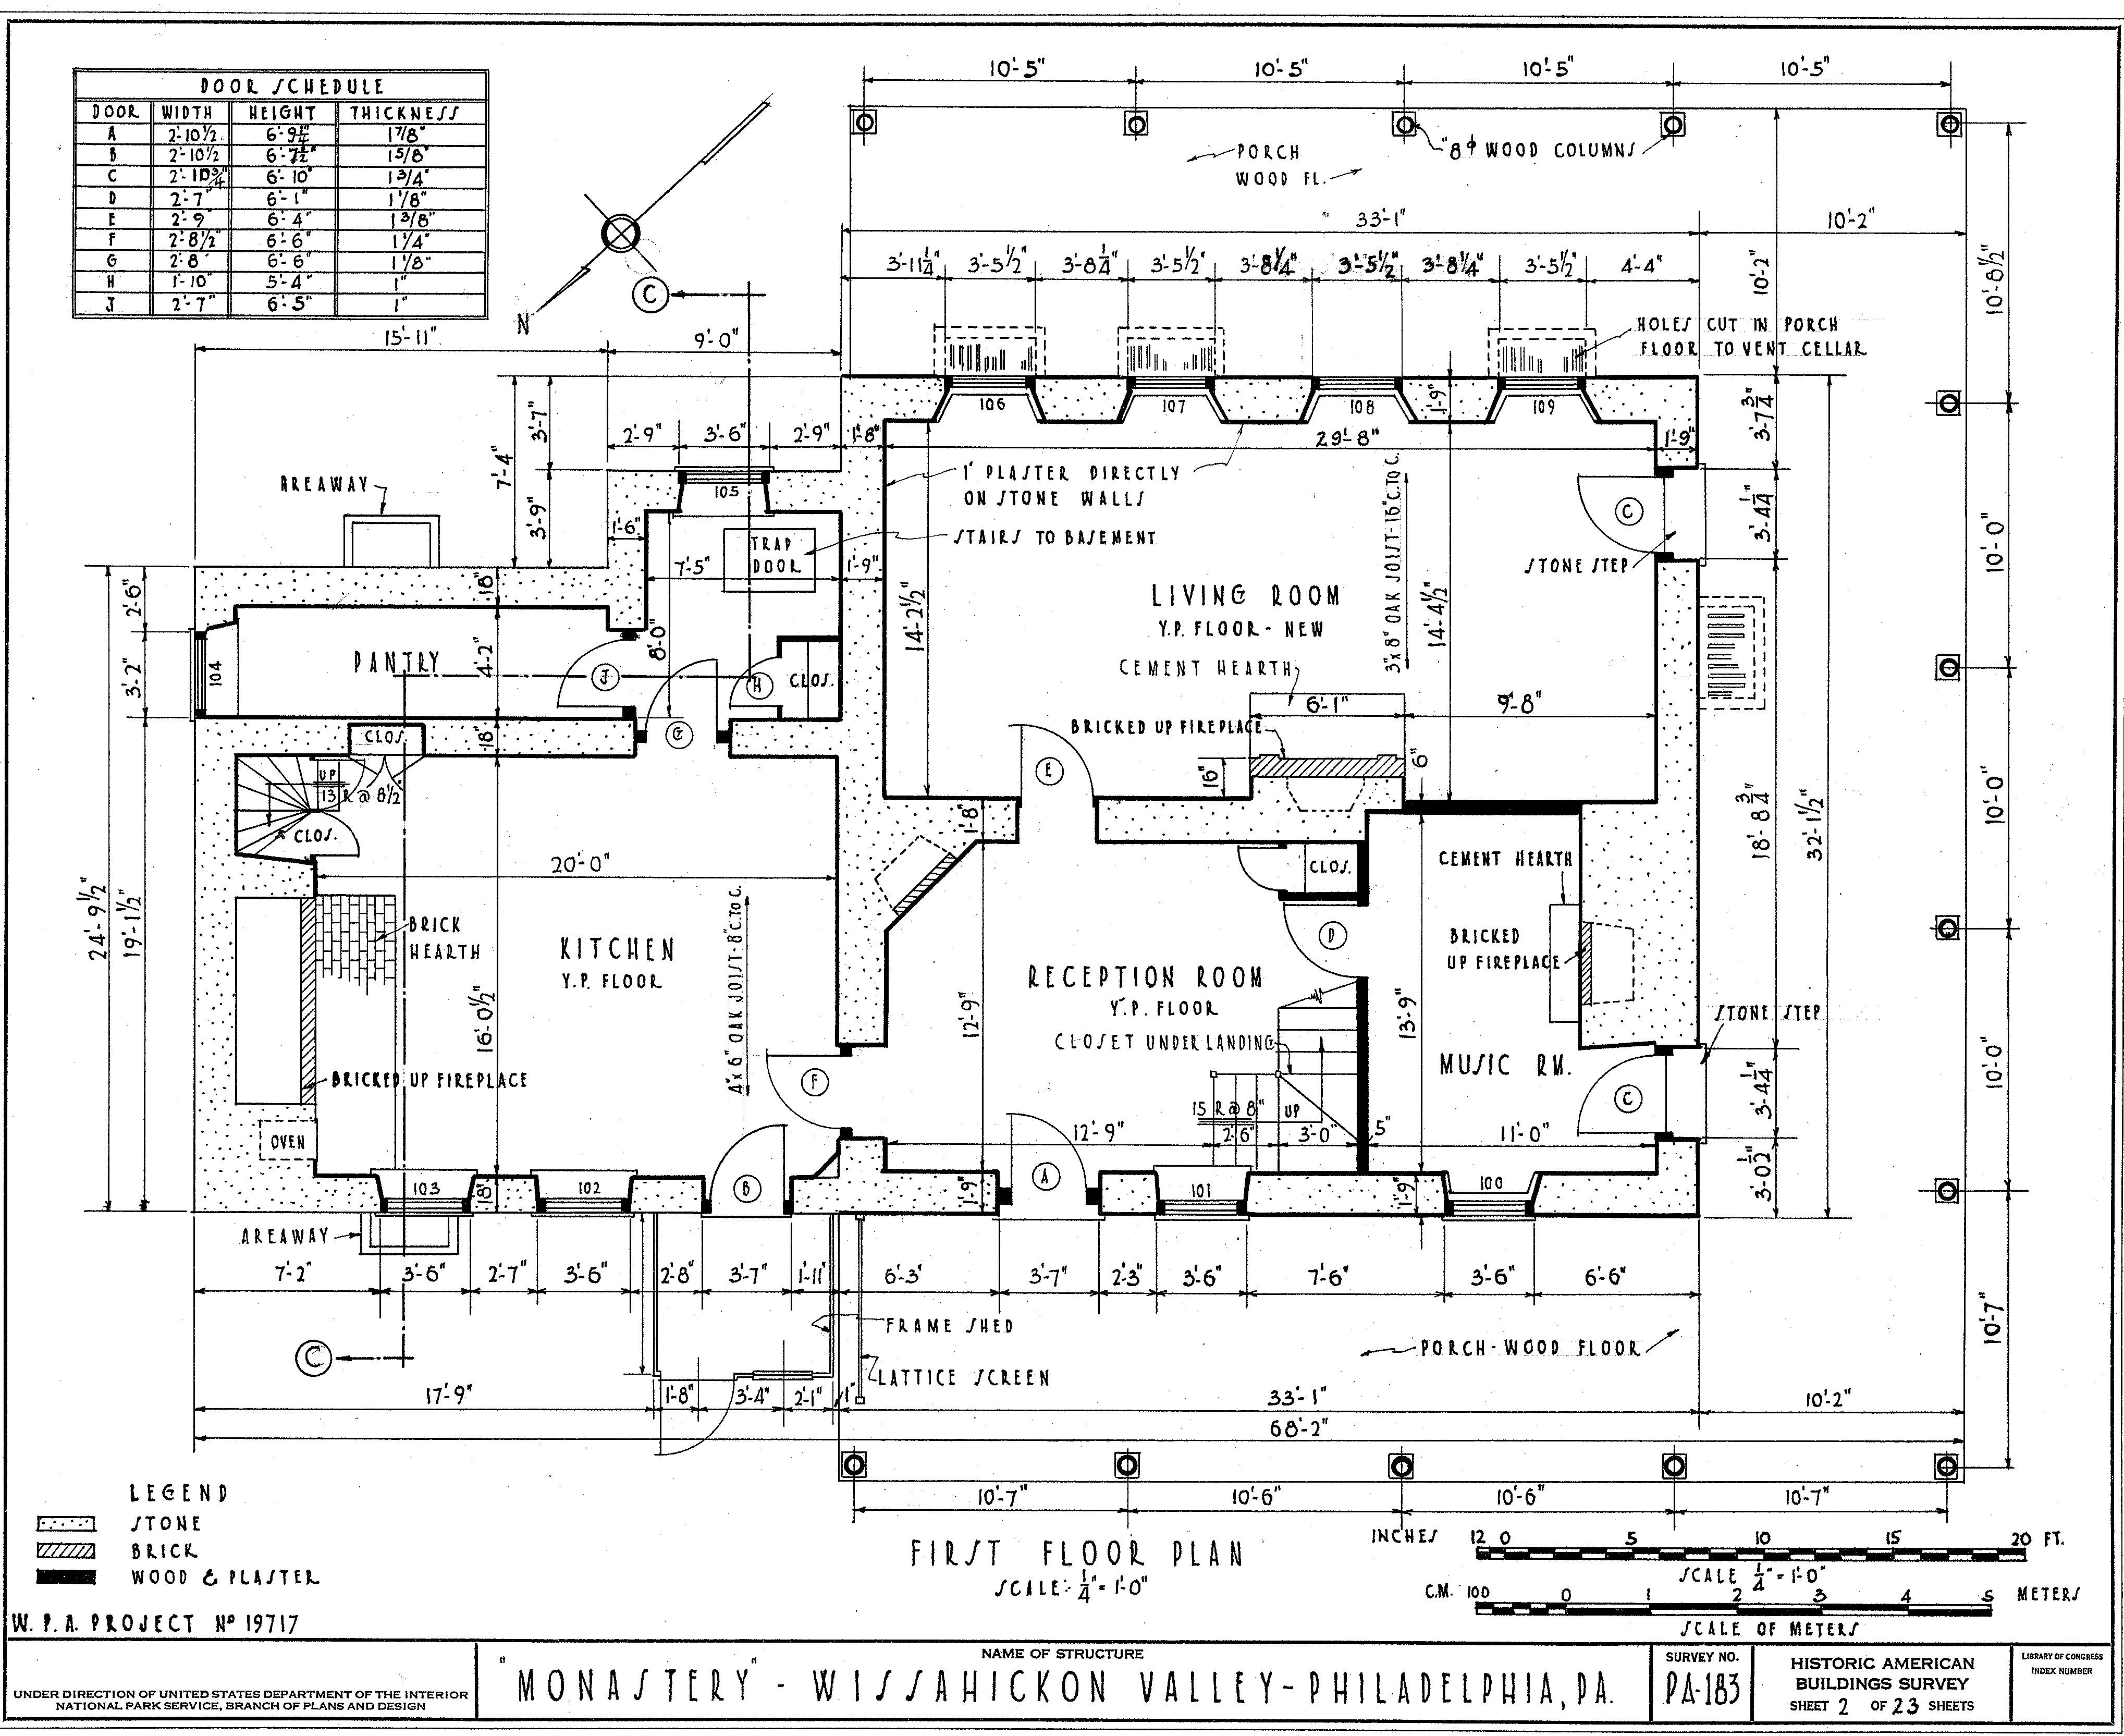 Moonbeams floorplan 4